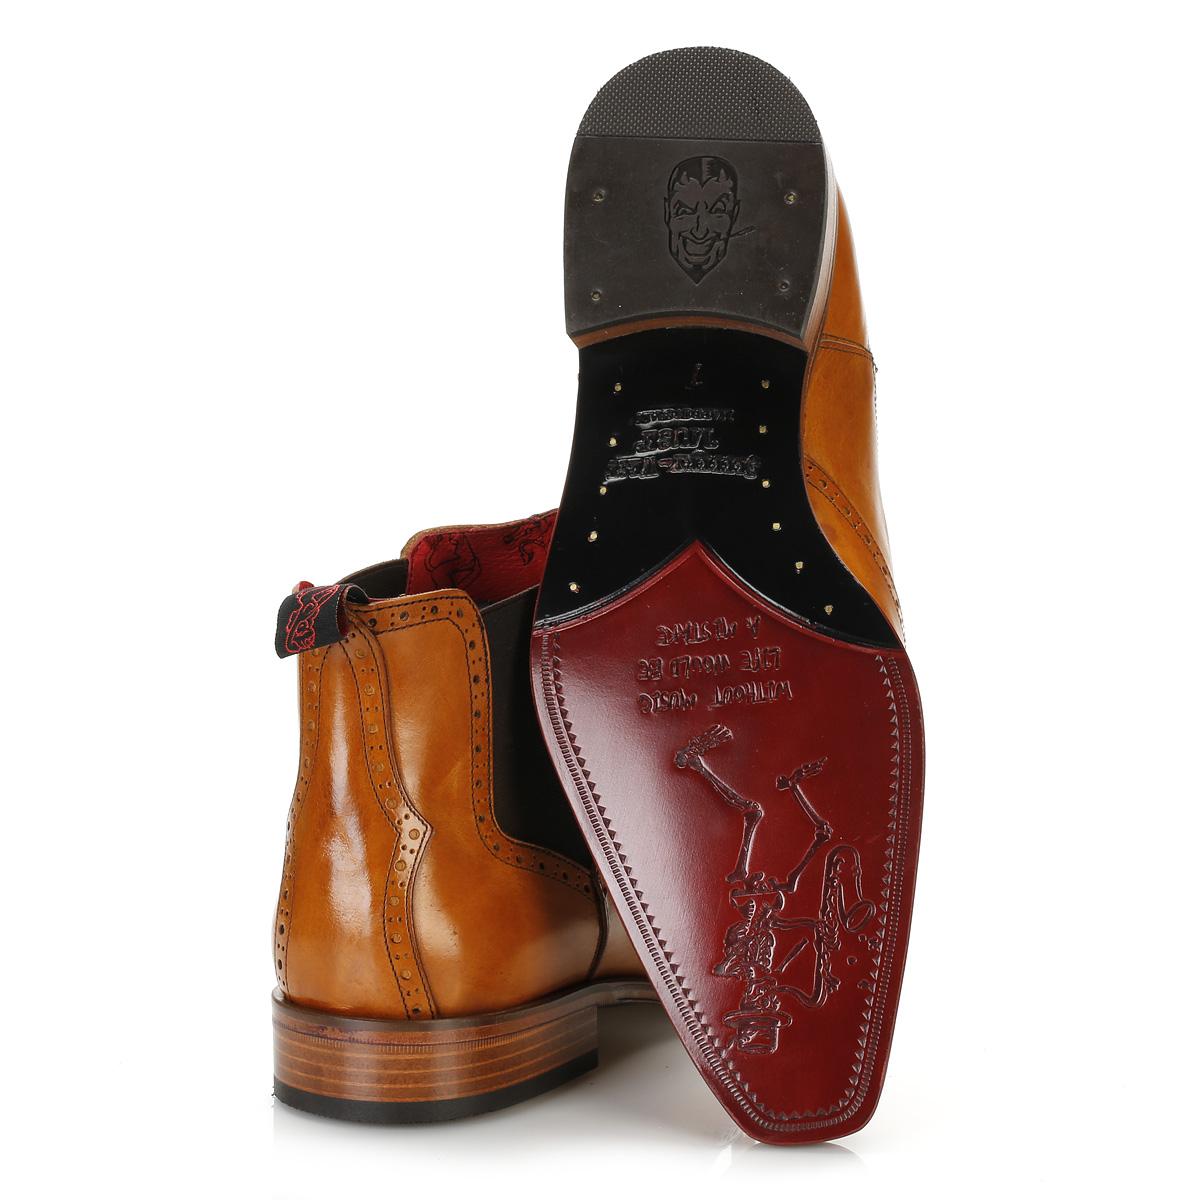 Jeffery West Mens Shoes